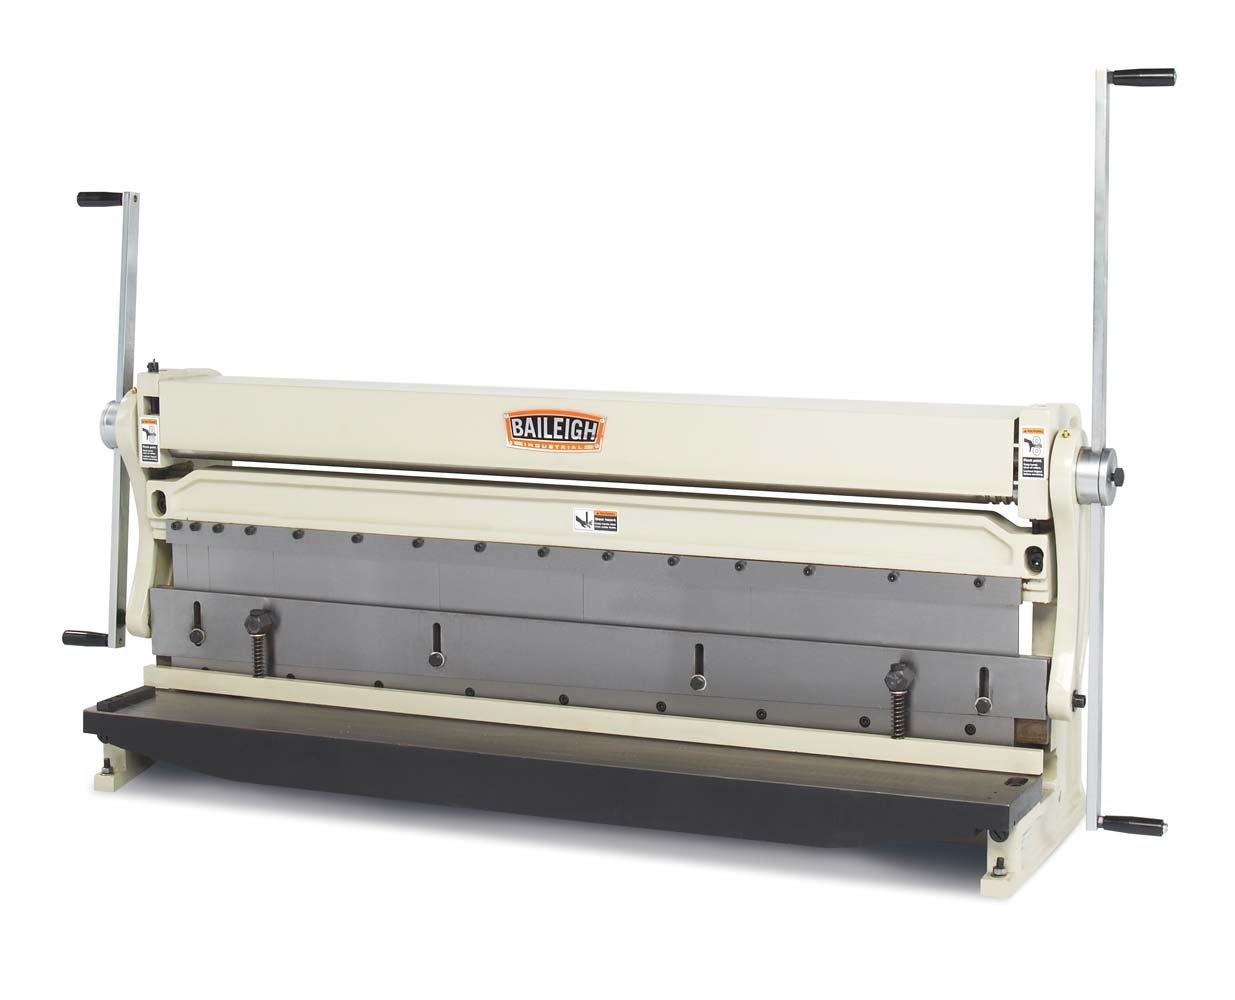 Baileigh SBR-5220 3-in-1 Combination Shear Brake Roll Machine 52 Bed Width 20-Gauge Mild Steal Capacity